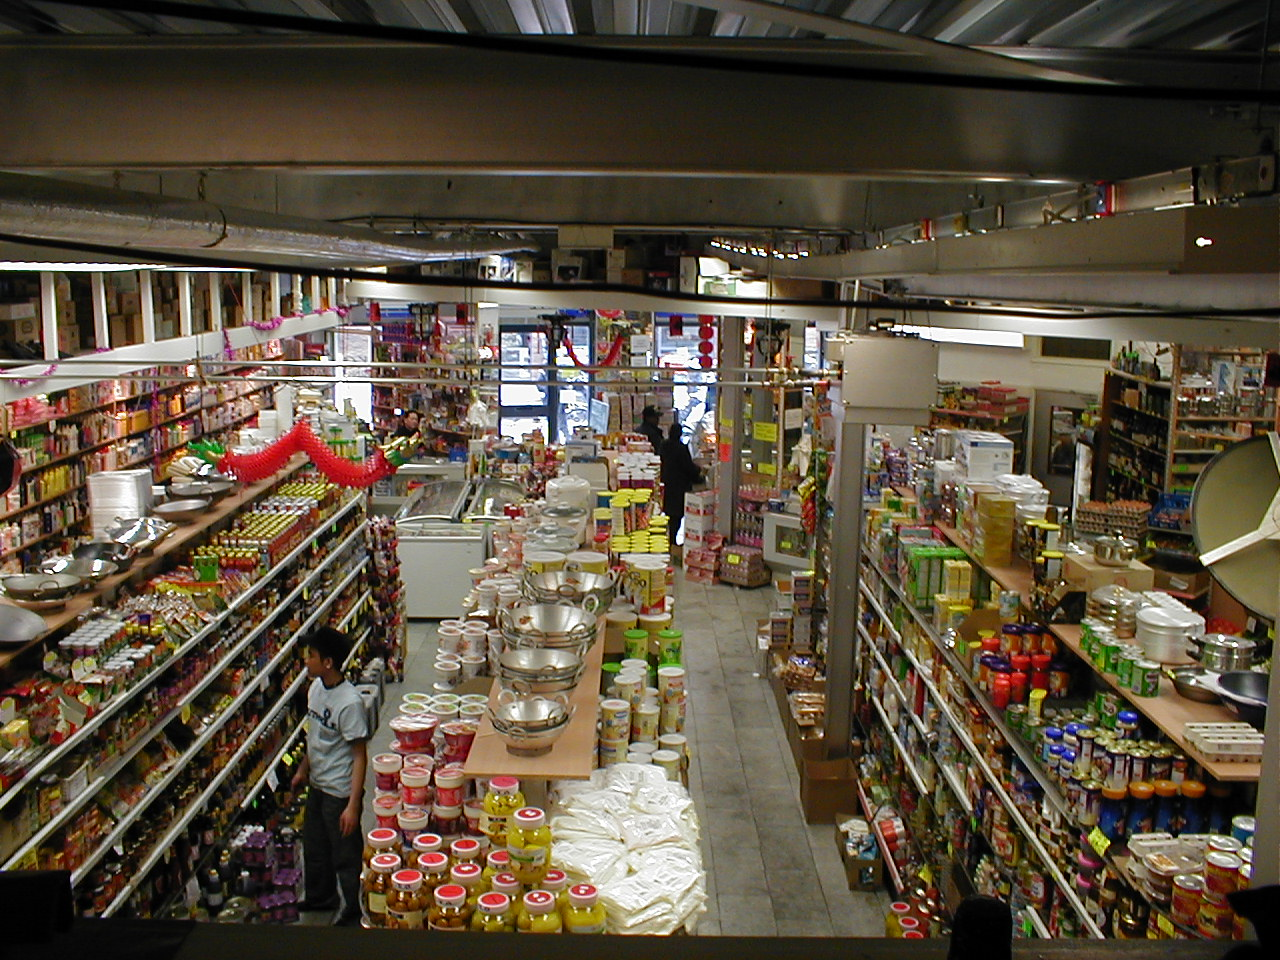 dario shop mall supermarket asian goods isles